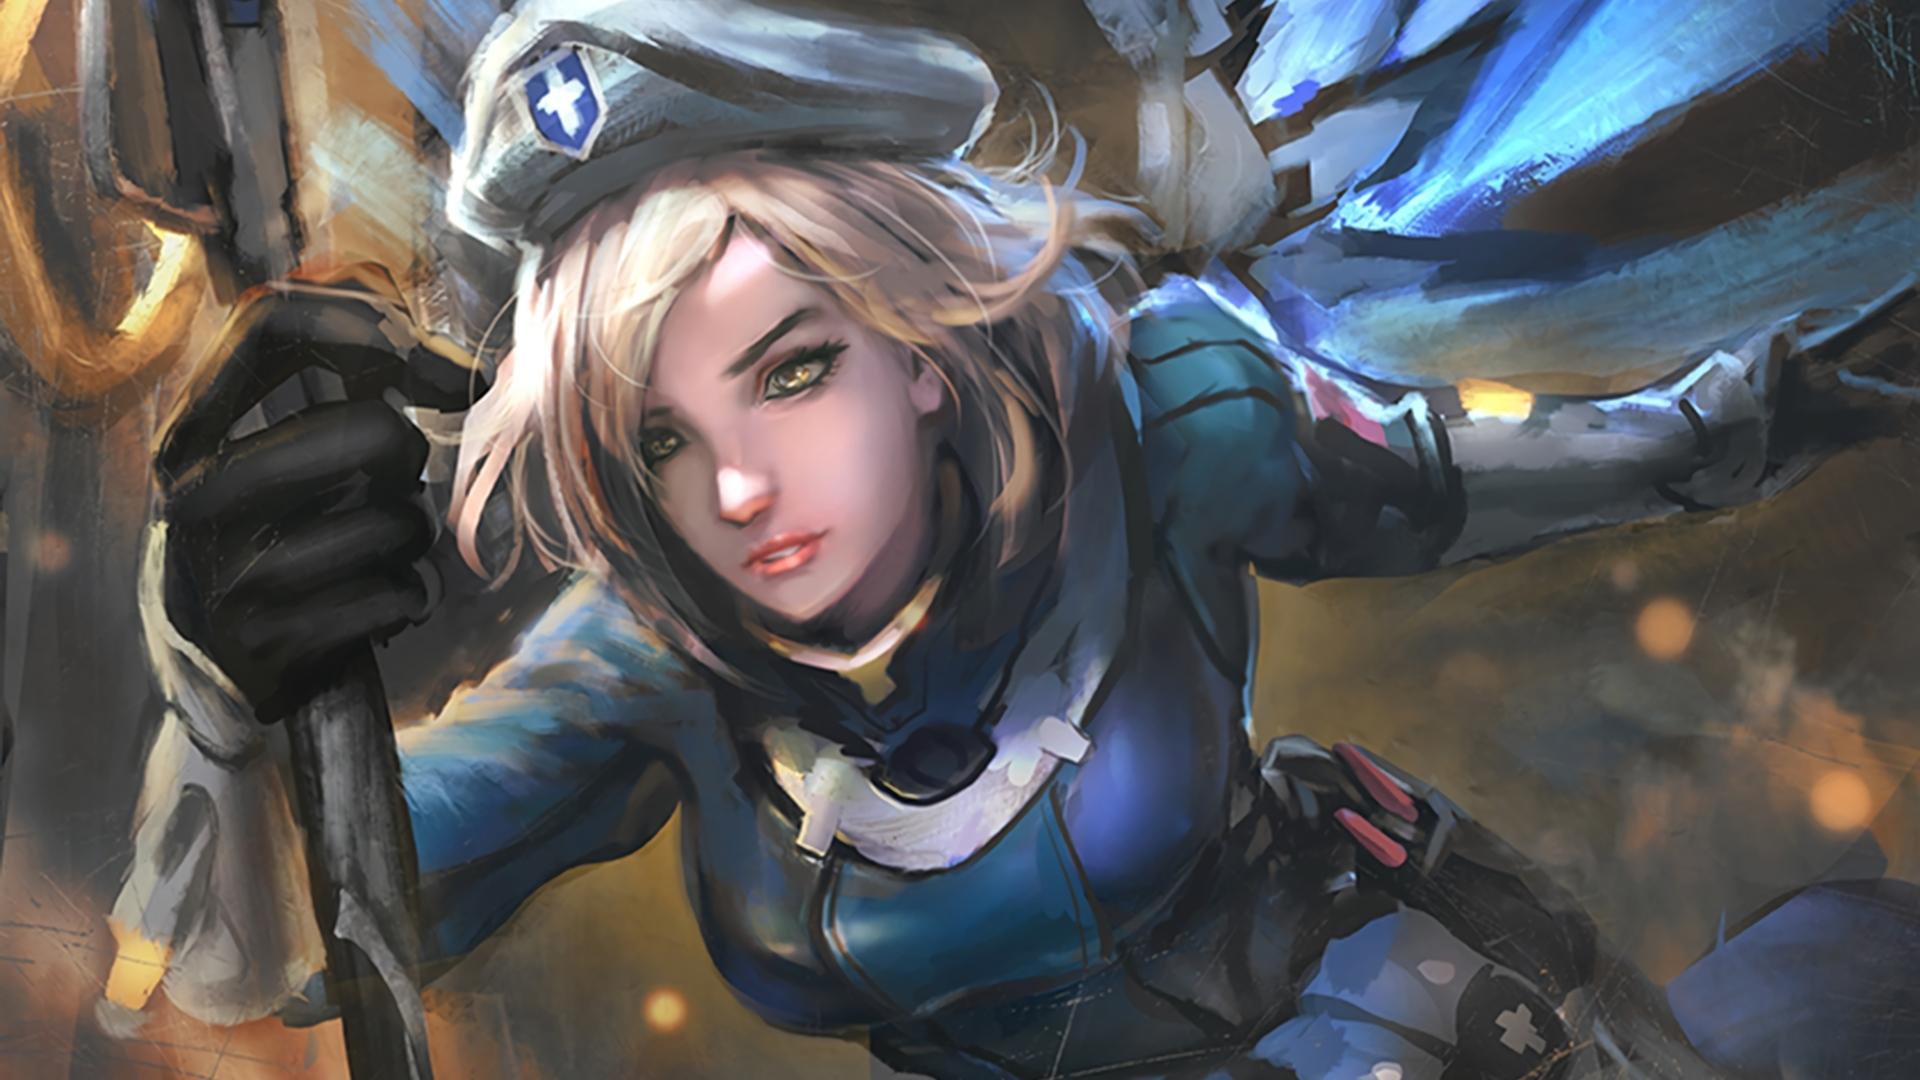 Wallpaper : video games, Mercy Overwatch, women, artwork ...